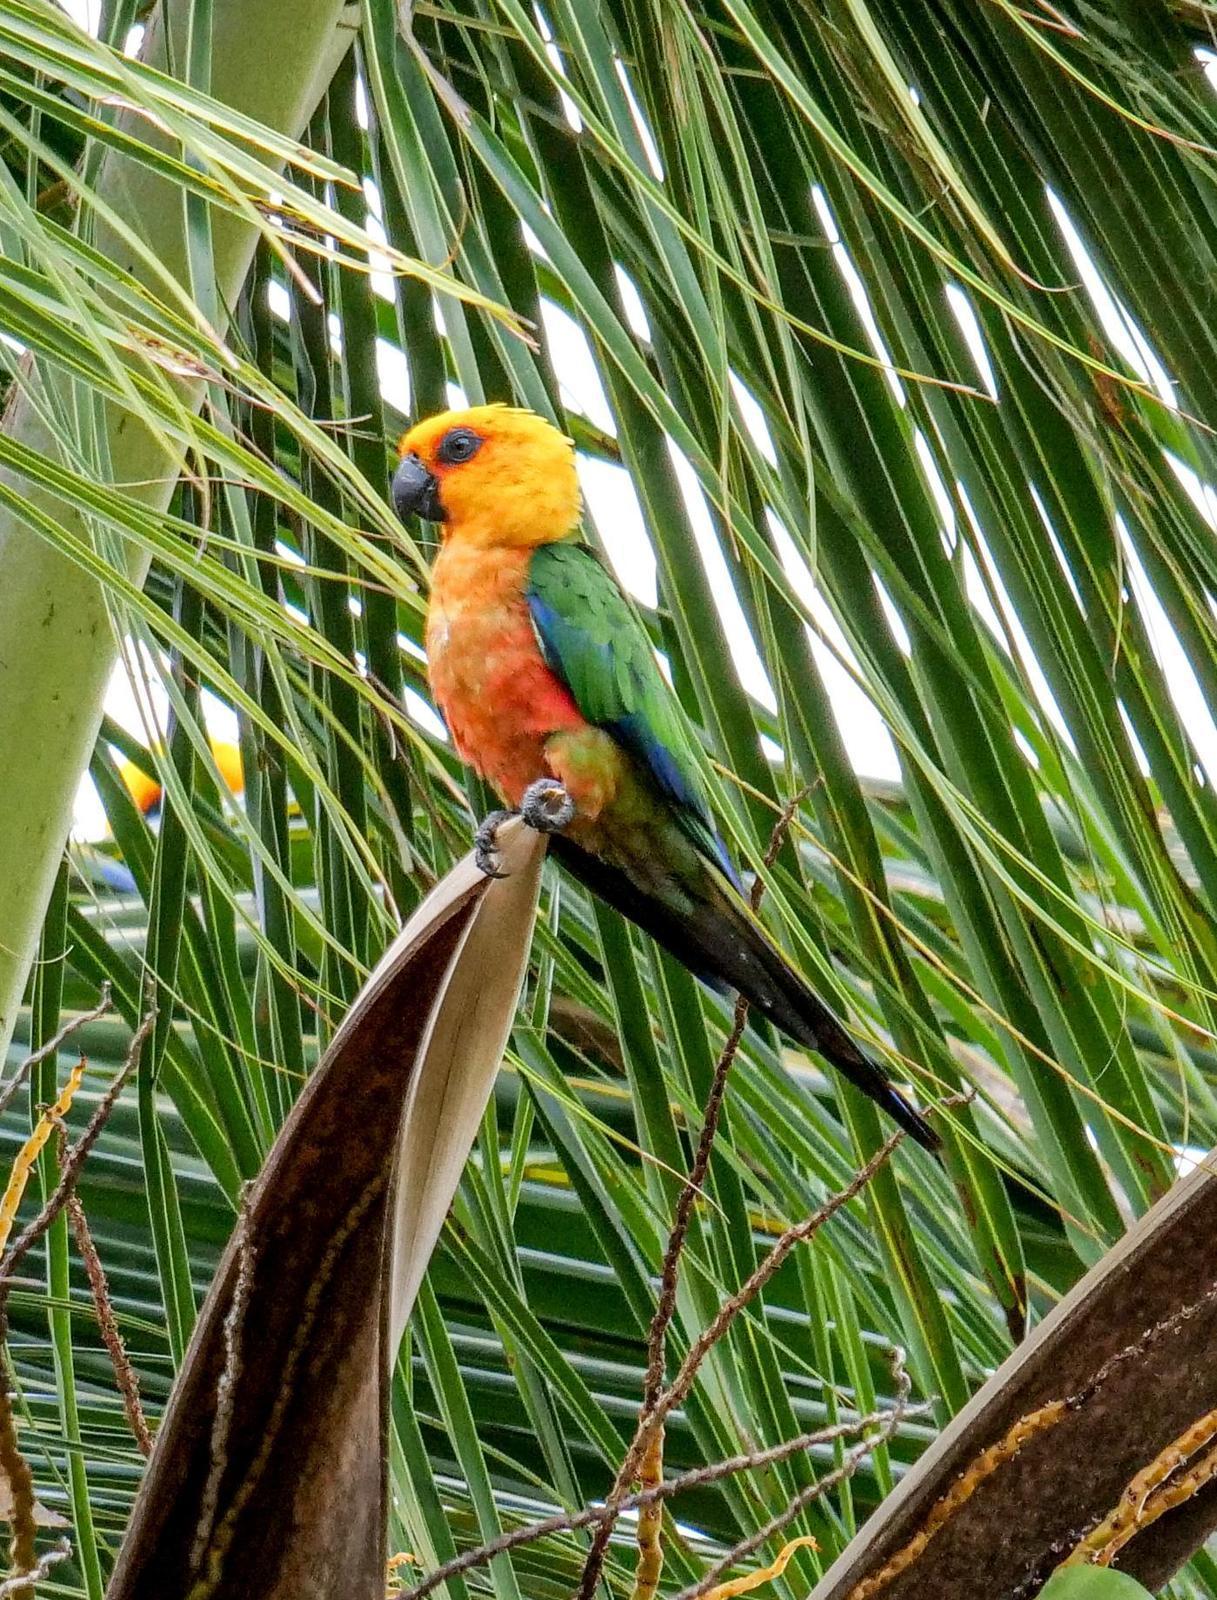 Jandaya Parakeet Photo by Roger Horn